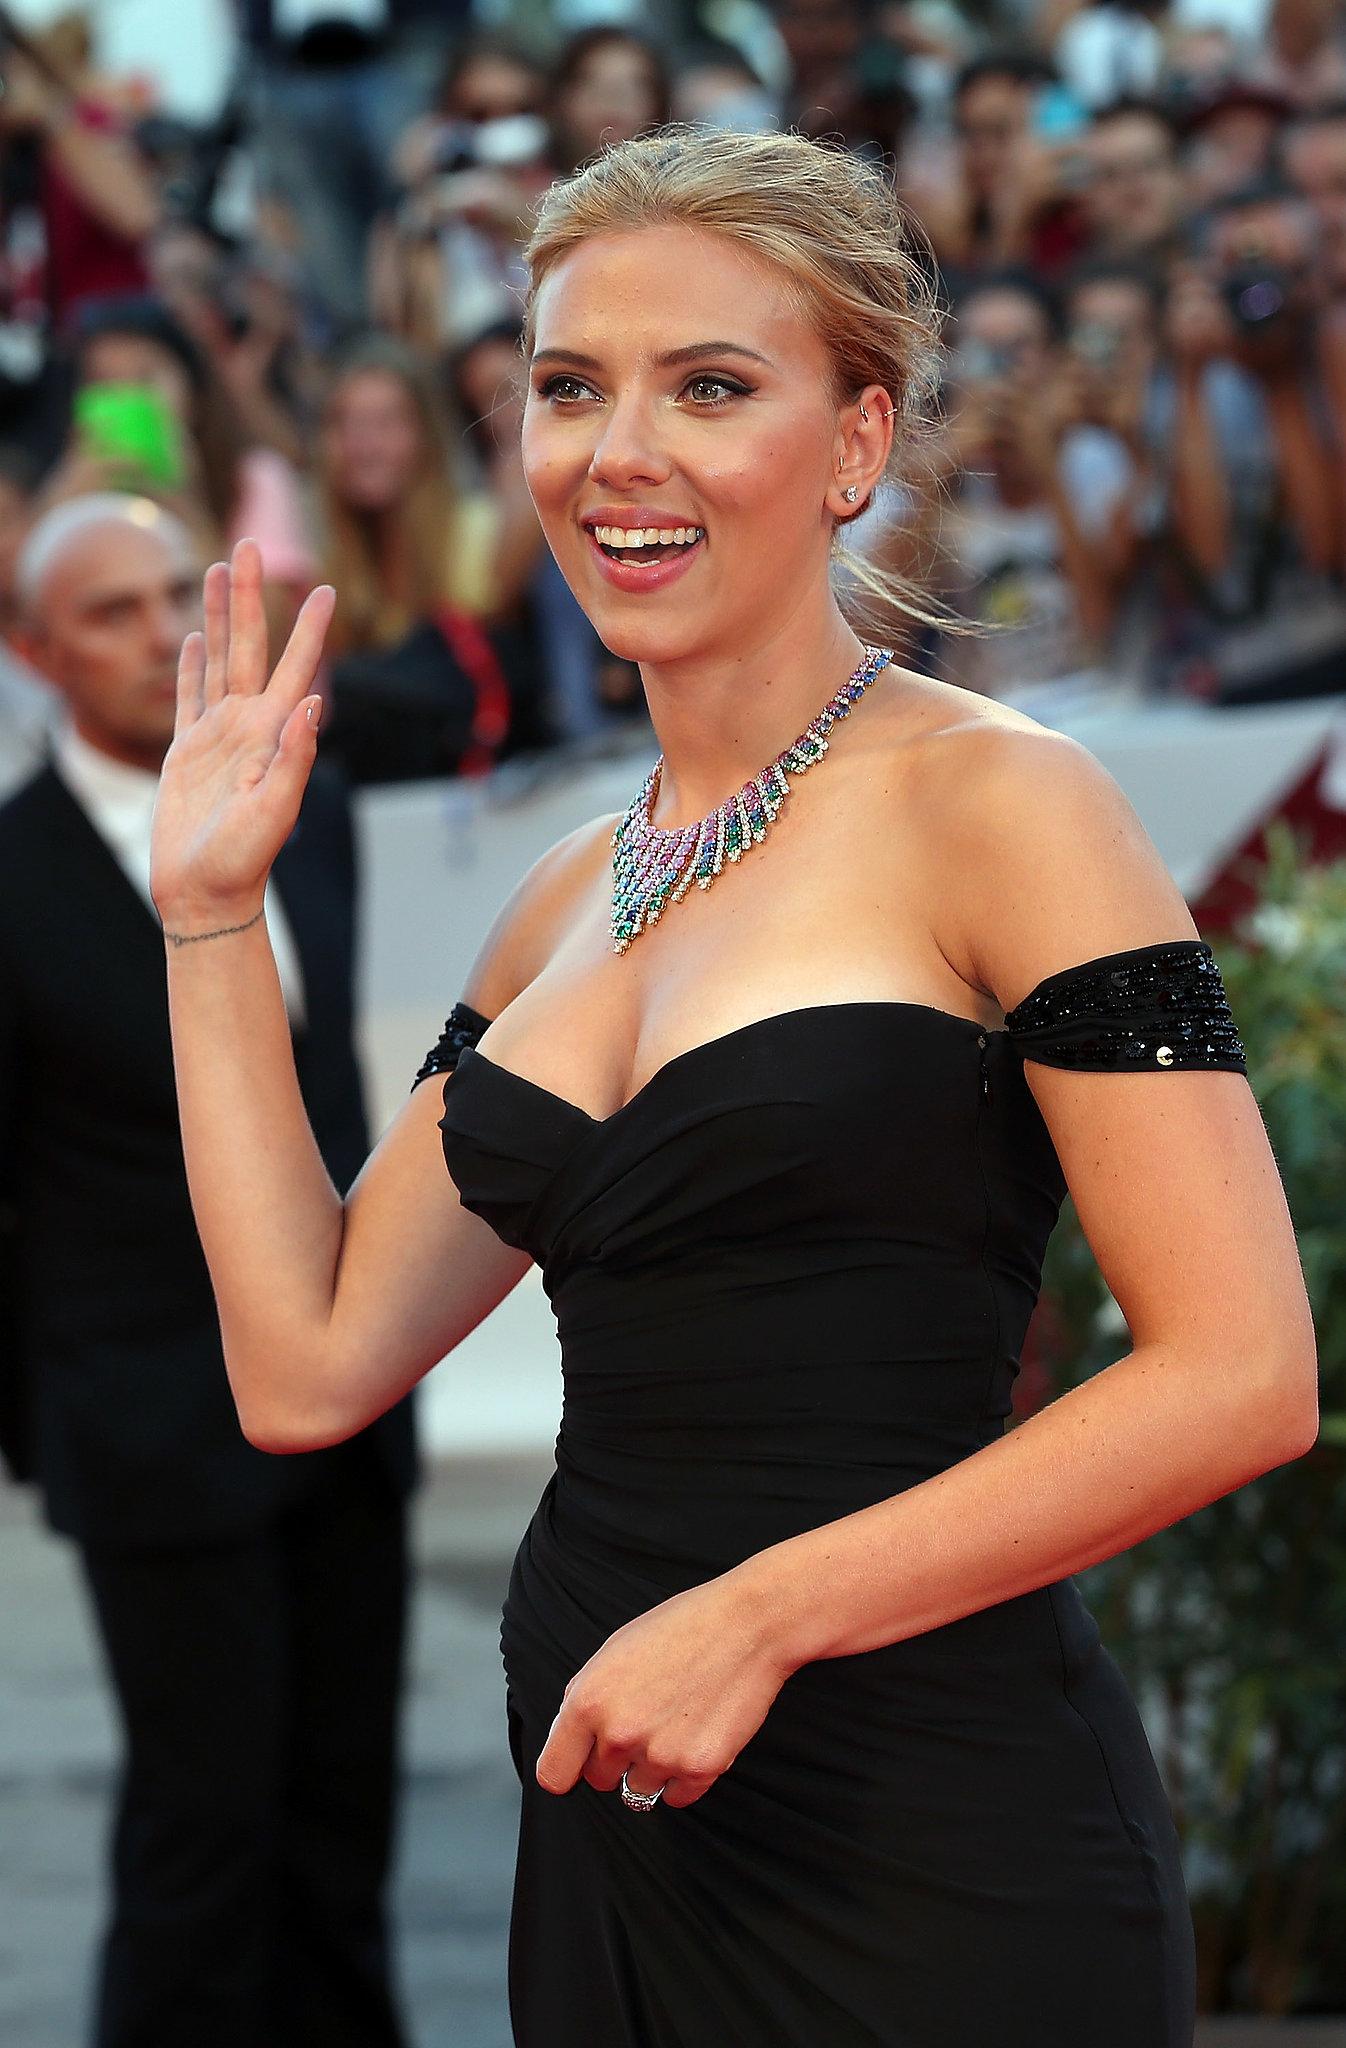 Scarlett Johansson attended the premiere of Under the Skin